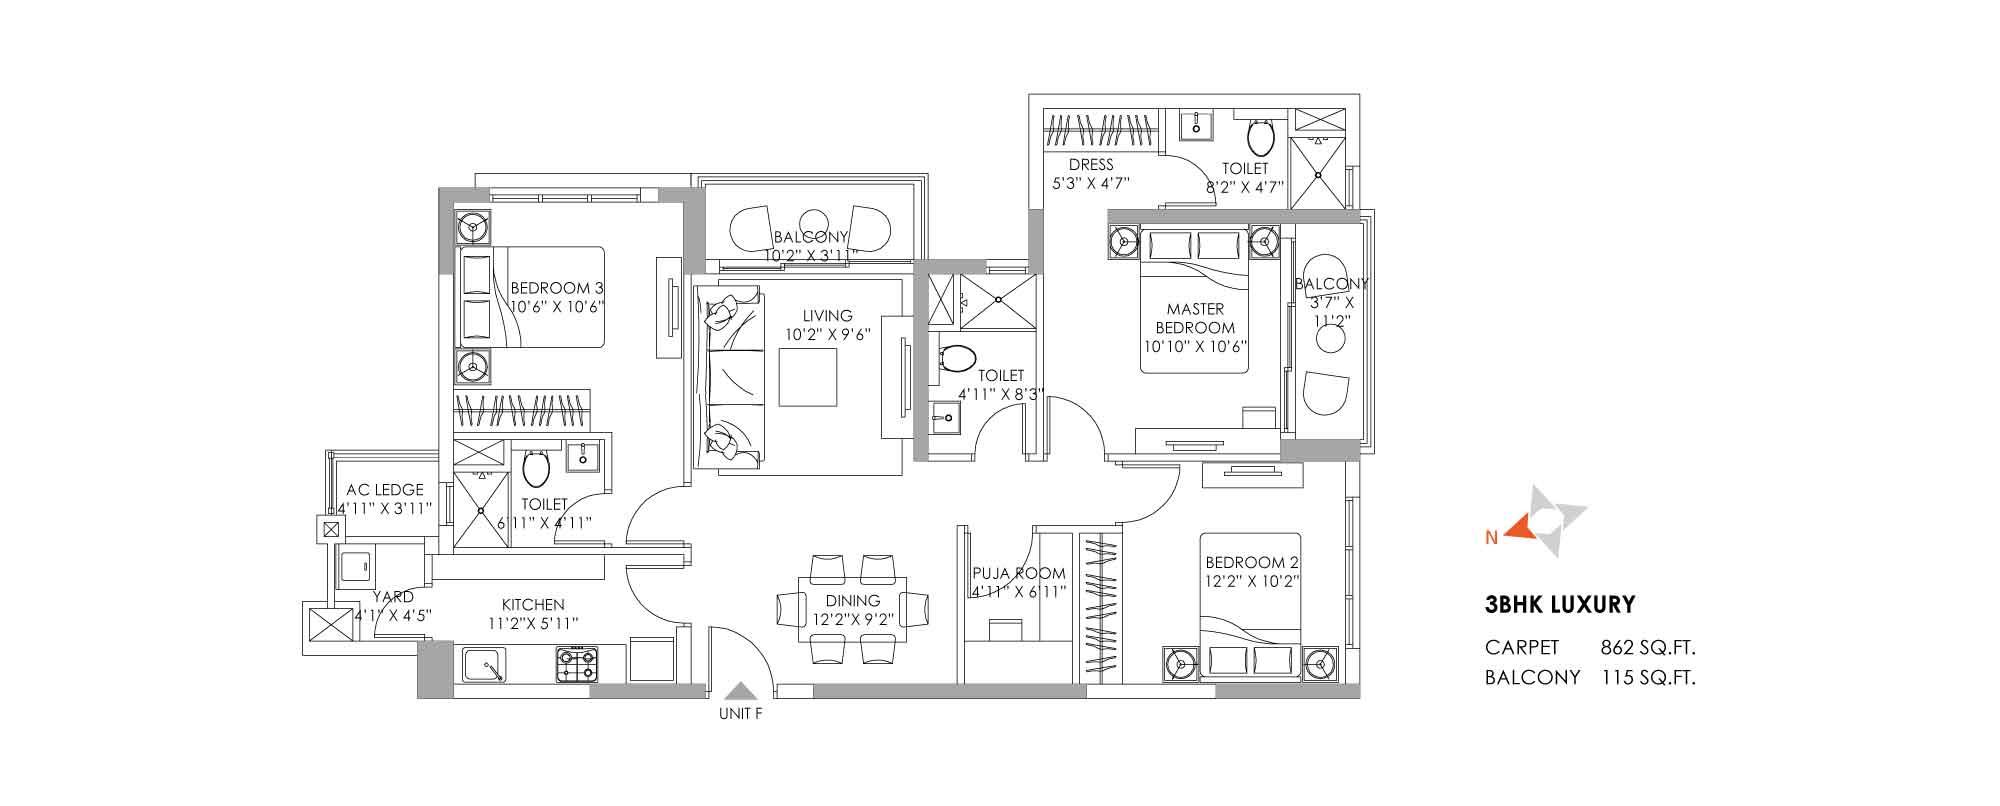 One10 Unit Plan Luxury 862 SQFT